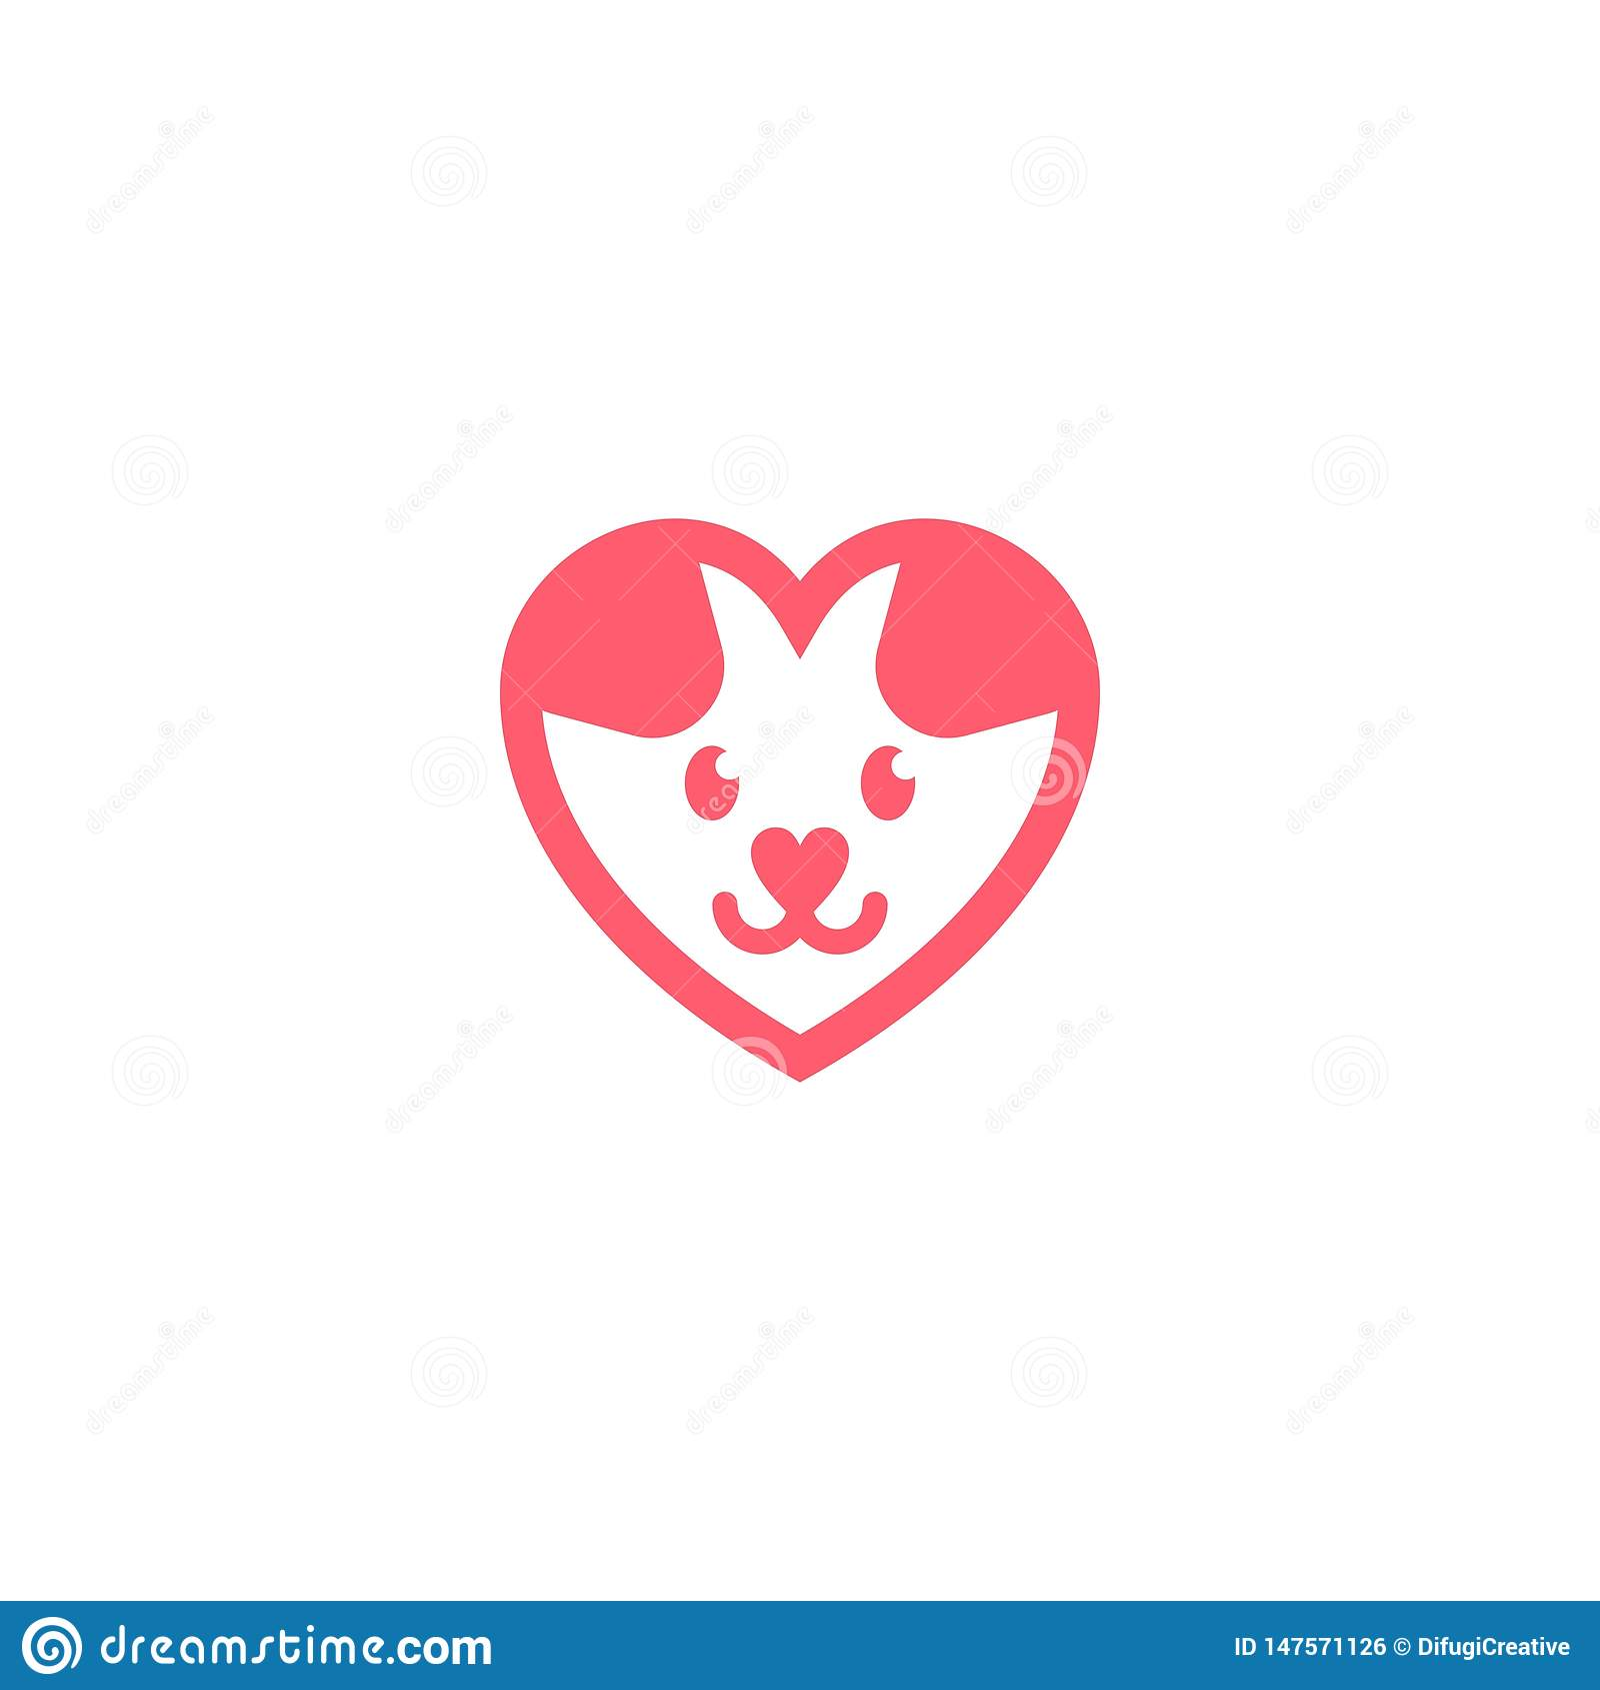 Cute dog puppy love logo